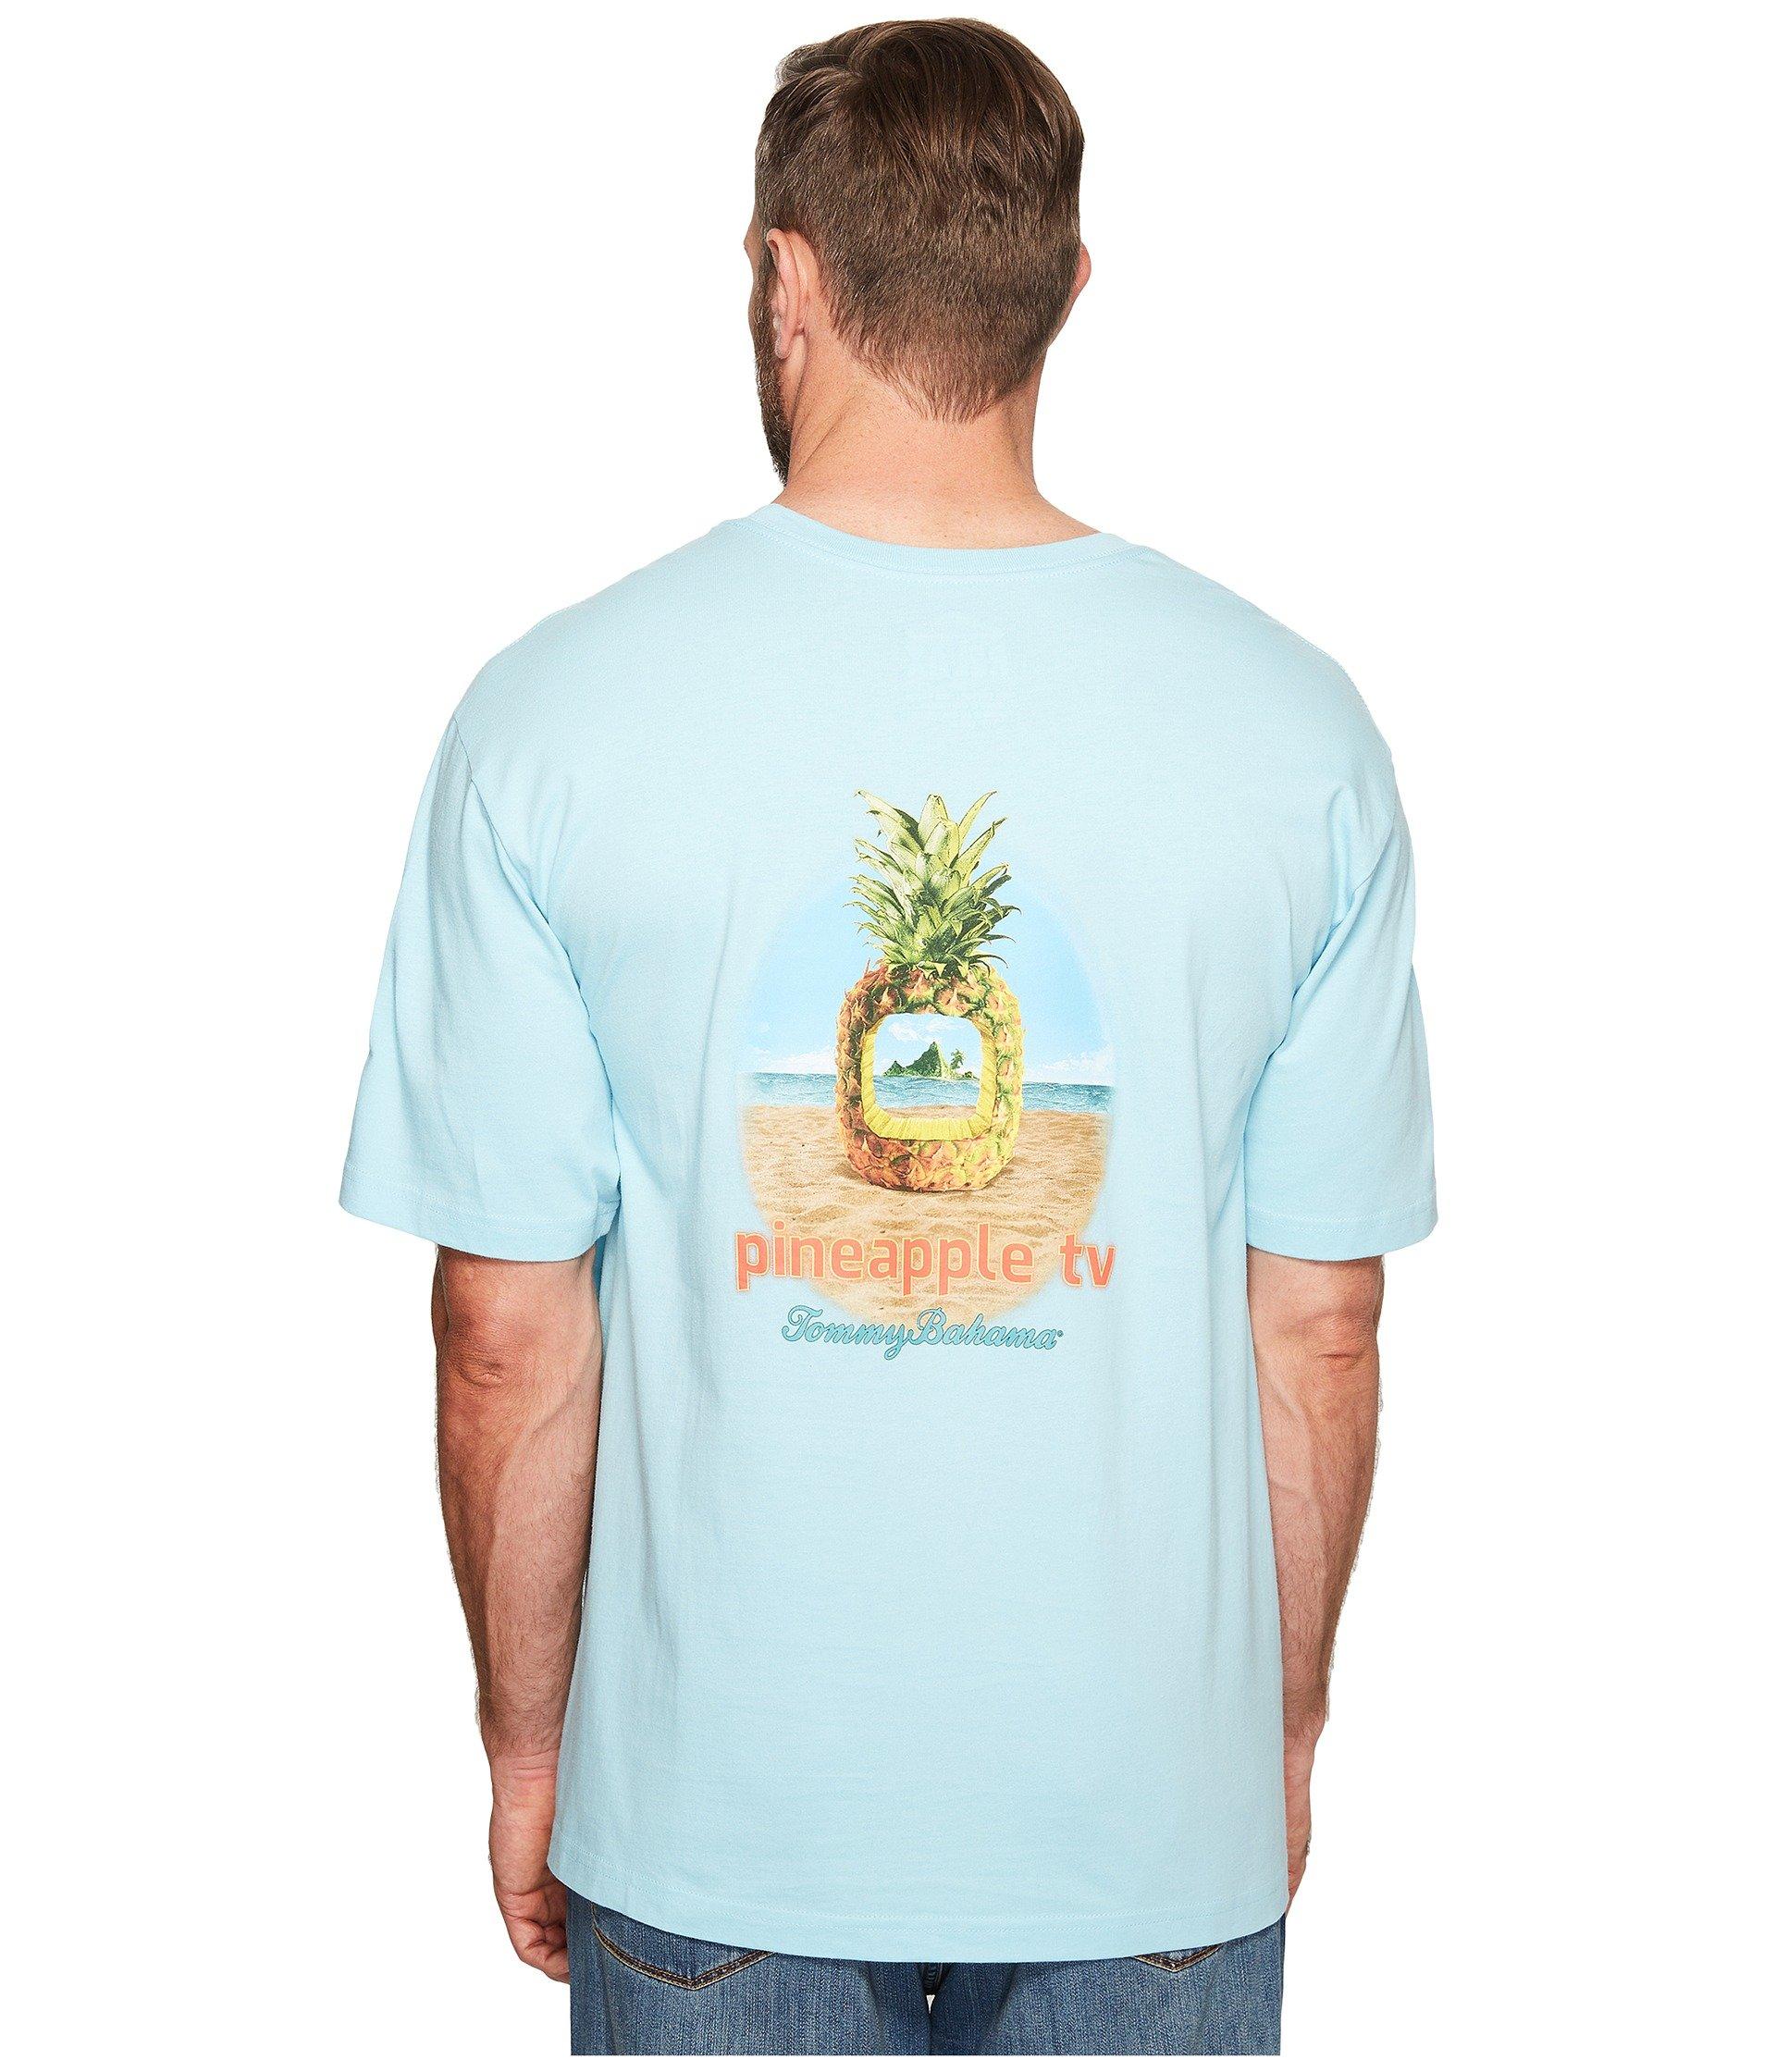 Tommy bahama big tall big tall pineapple tv tee at 6pm for Custom tommy bahama shirts